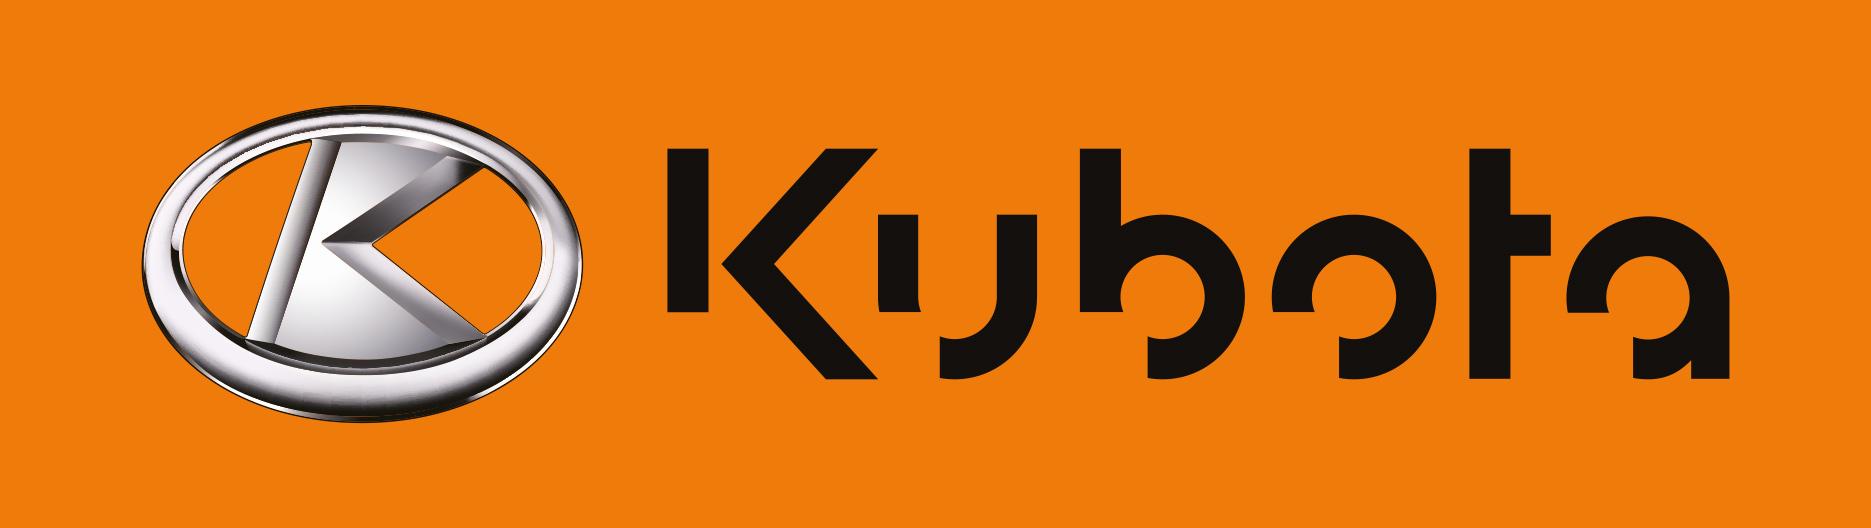 Logo orange K horizontal-Quadri